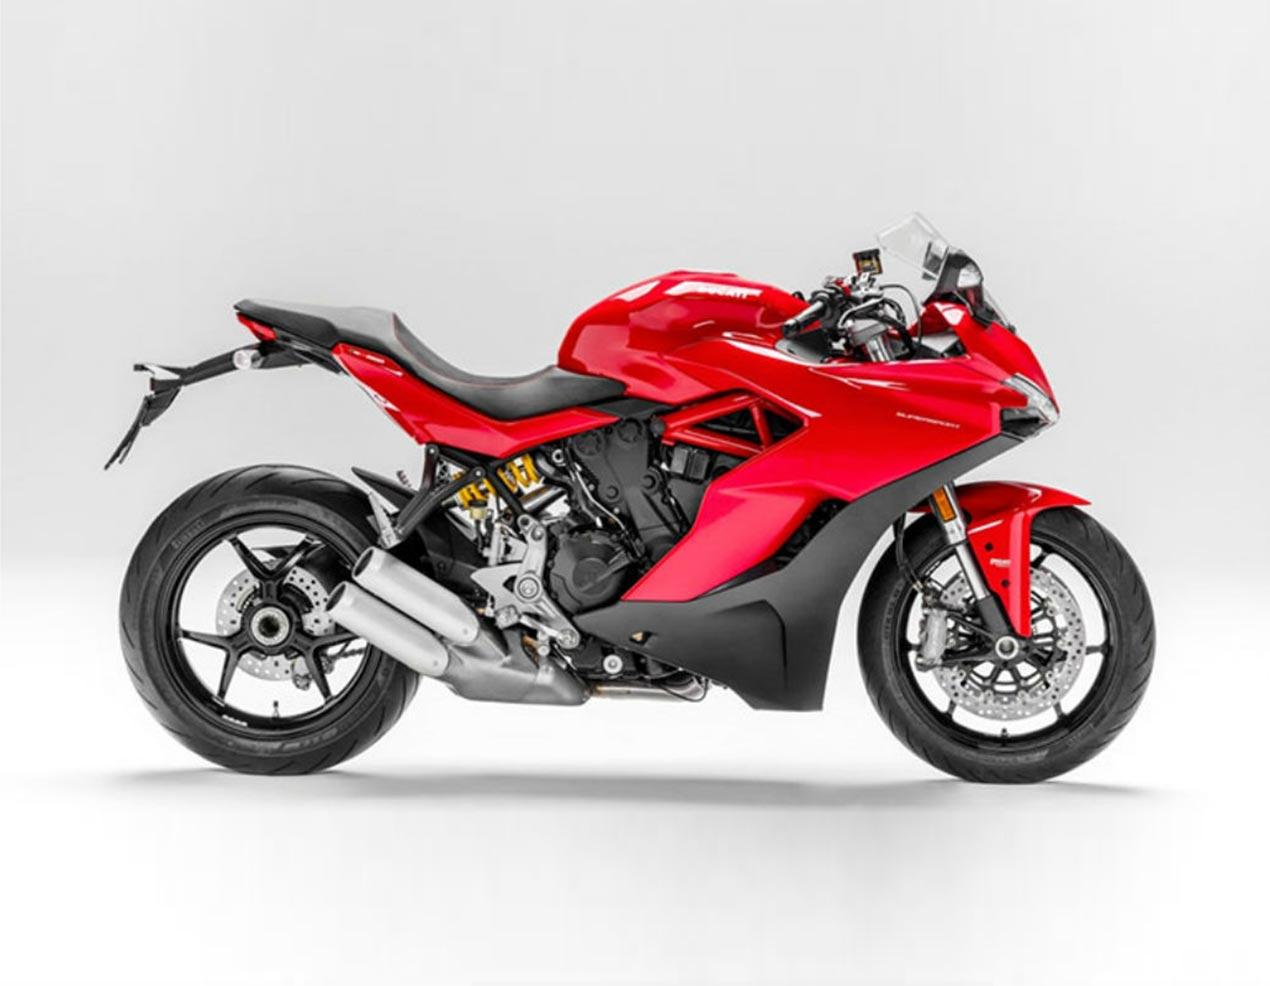 Ducati Supersport Photos Leaked